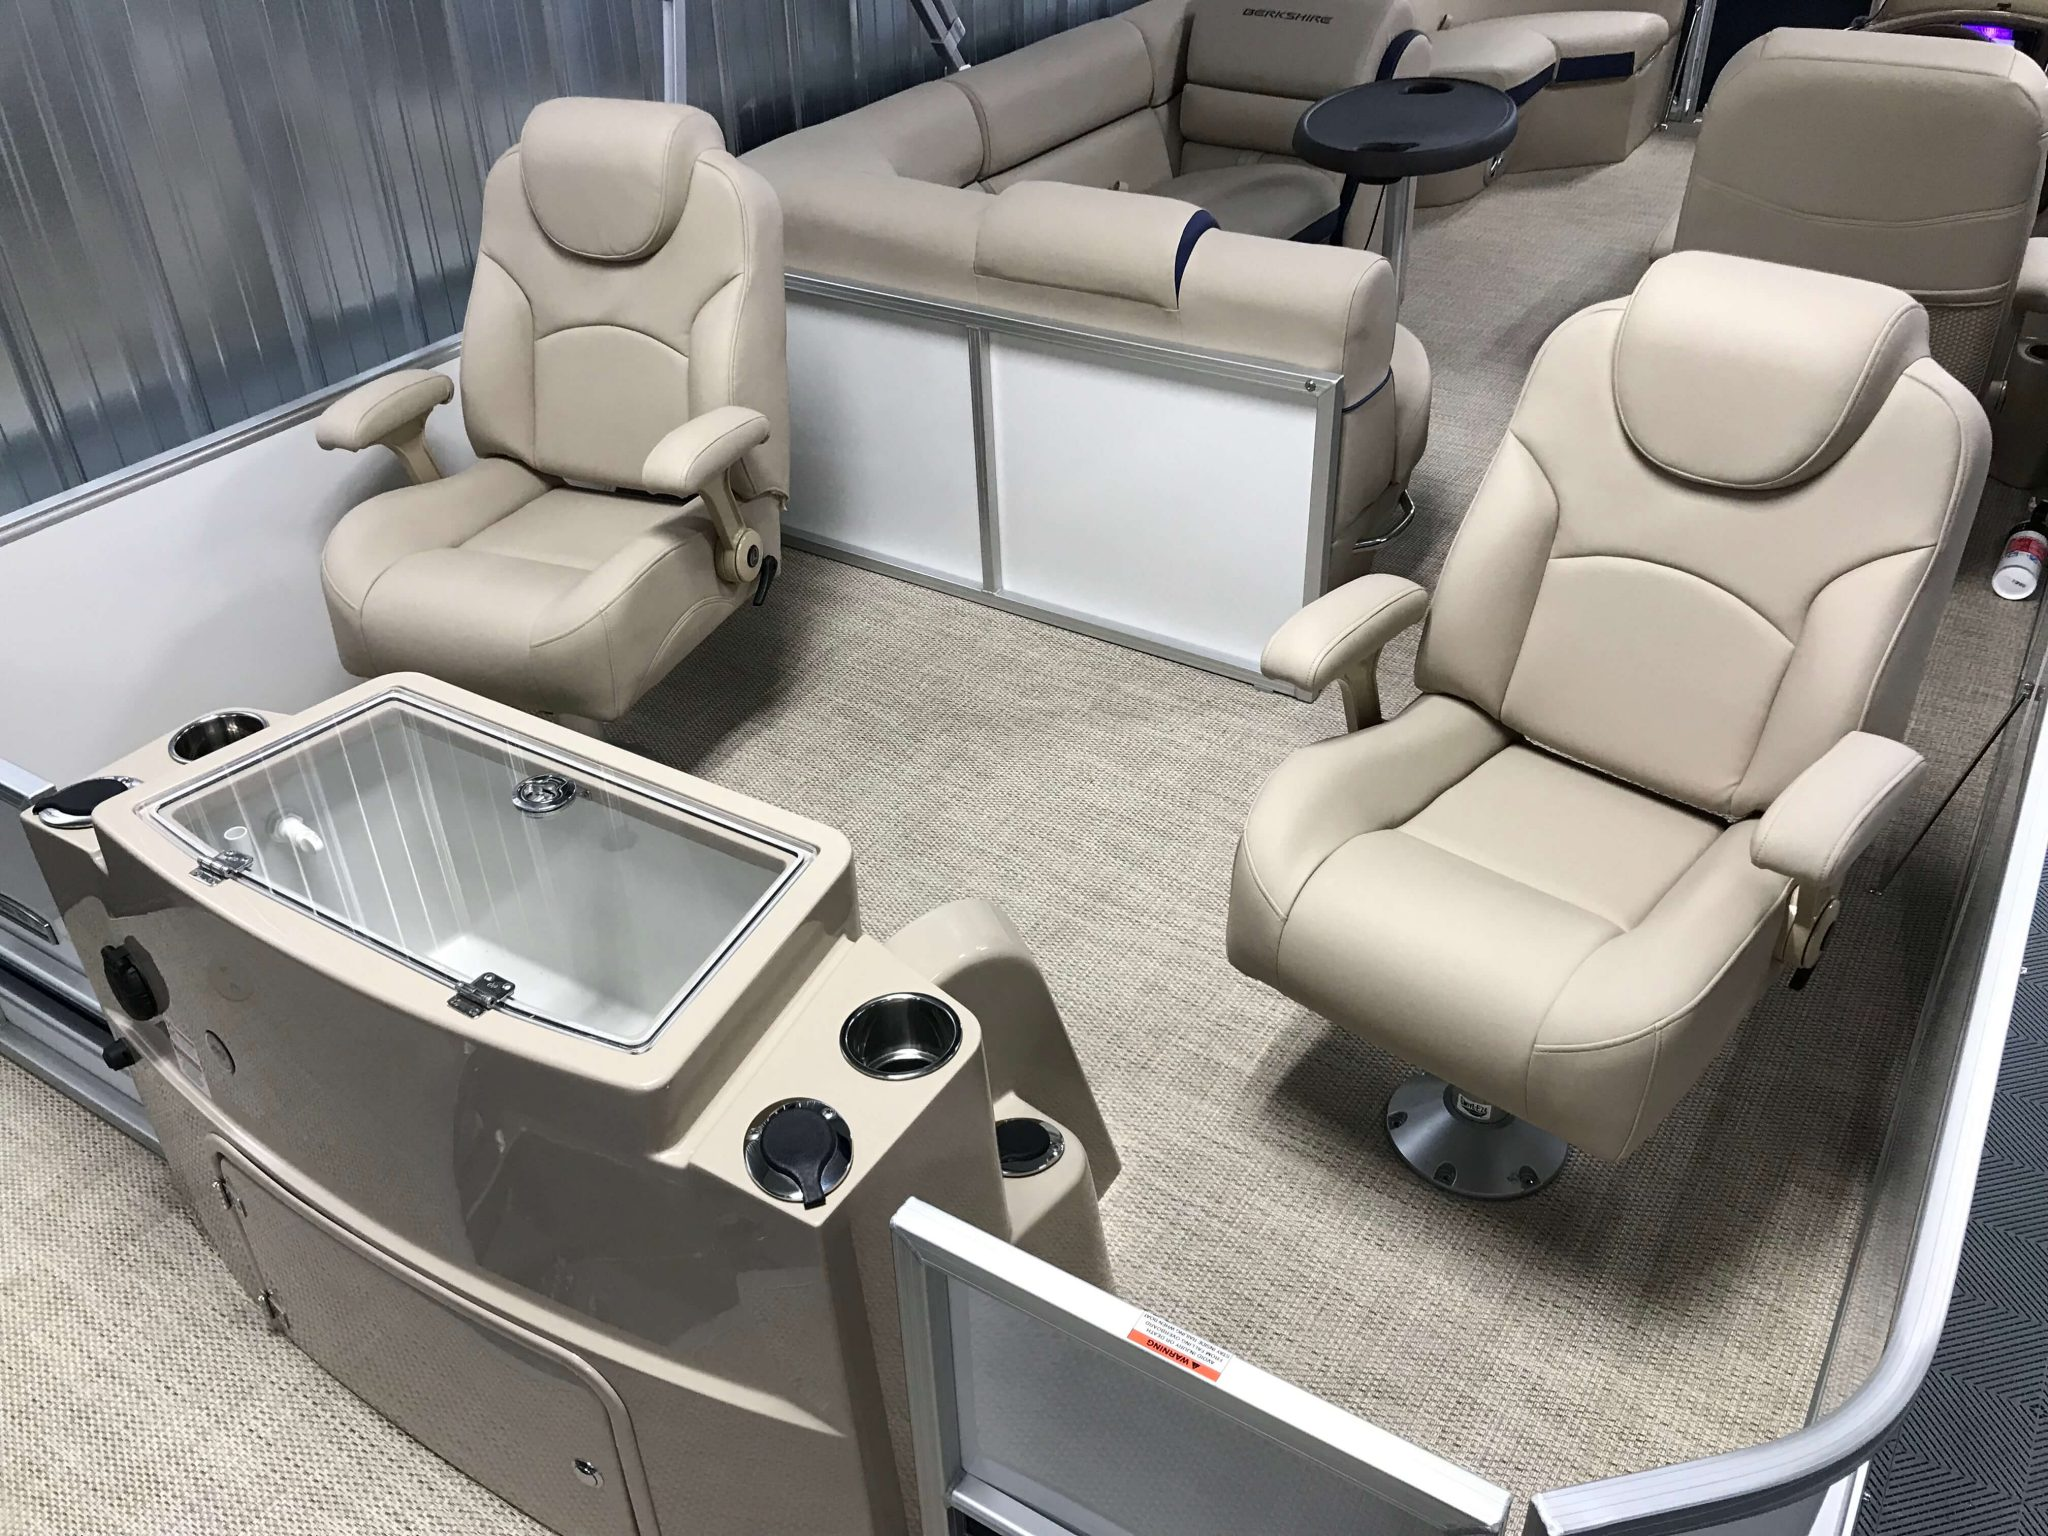 2019 Berkshire 23RFC2 STS Deluxe Pontoon RFC2 Seating Layout 1